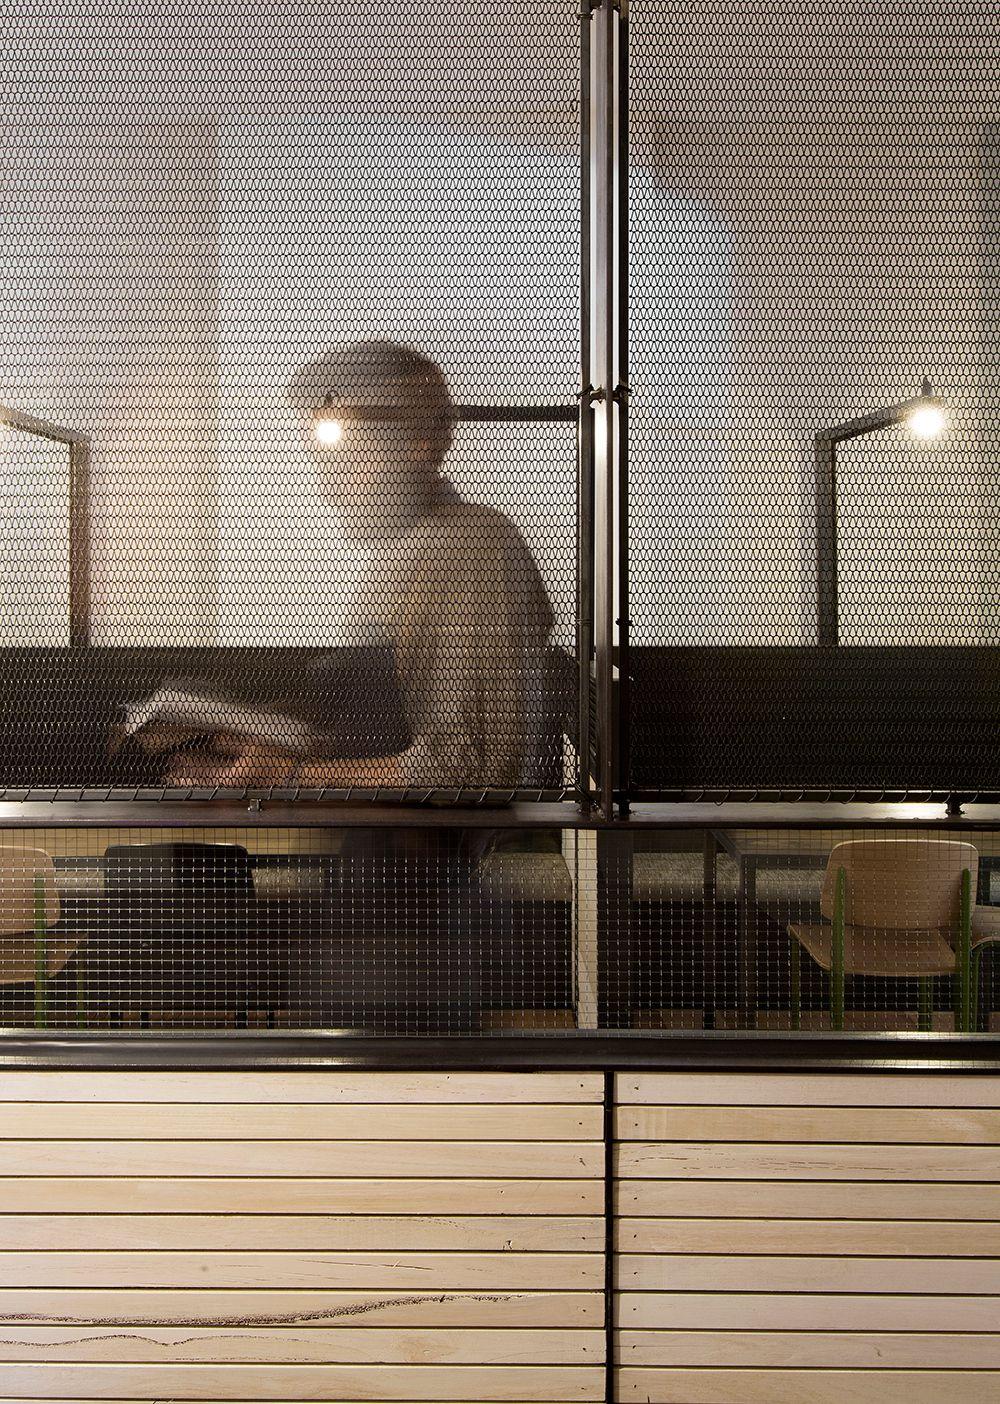 1000 images about interiors details on pinterest loft apartments melbourne and apartments breathe architecture studio yellowtrace